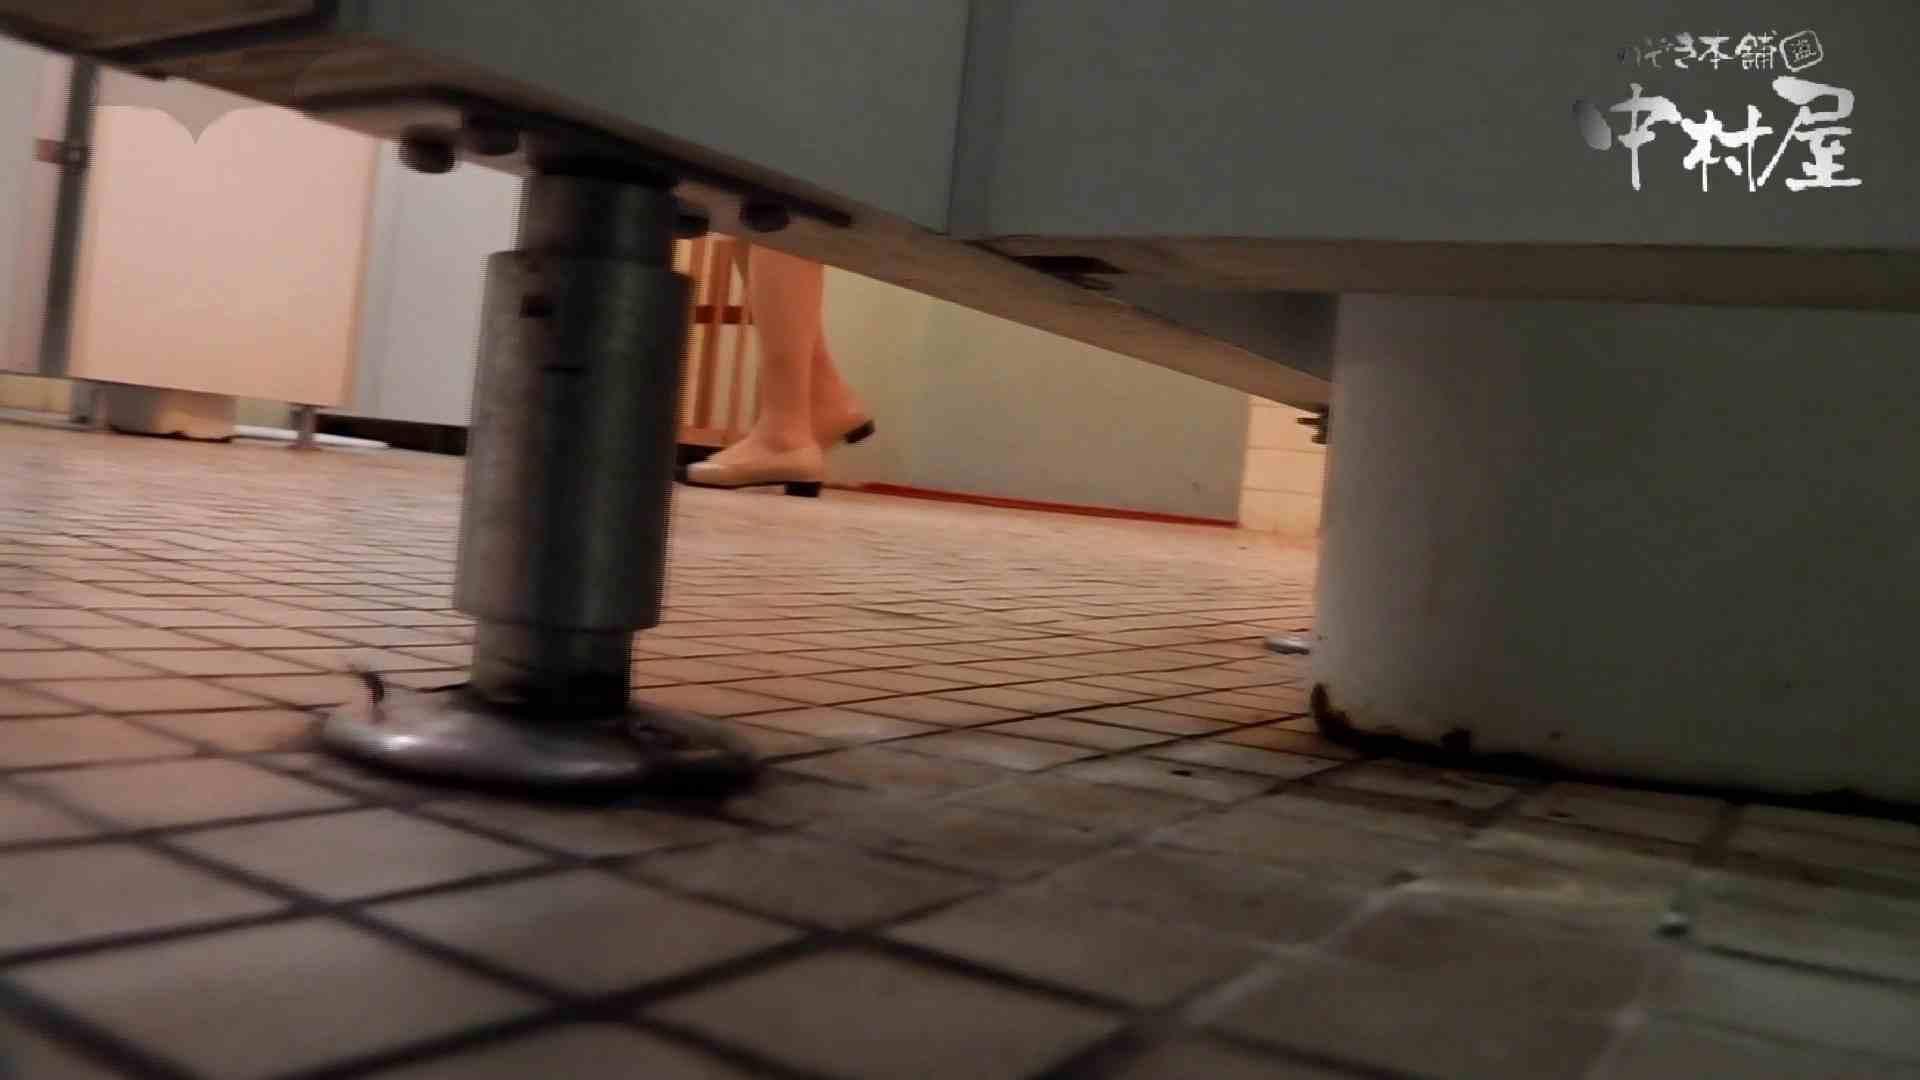 第三体育館潜入撮】第三体育館潜入撮File028 熟女特集!! 盗撮シリーズ えろ無修正画像 101PIX 92